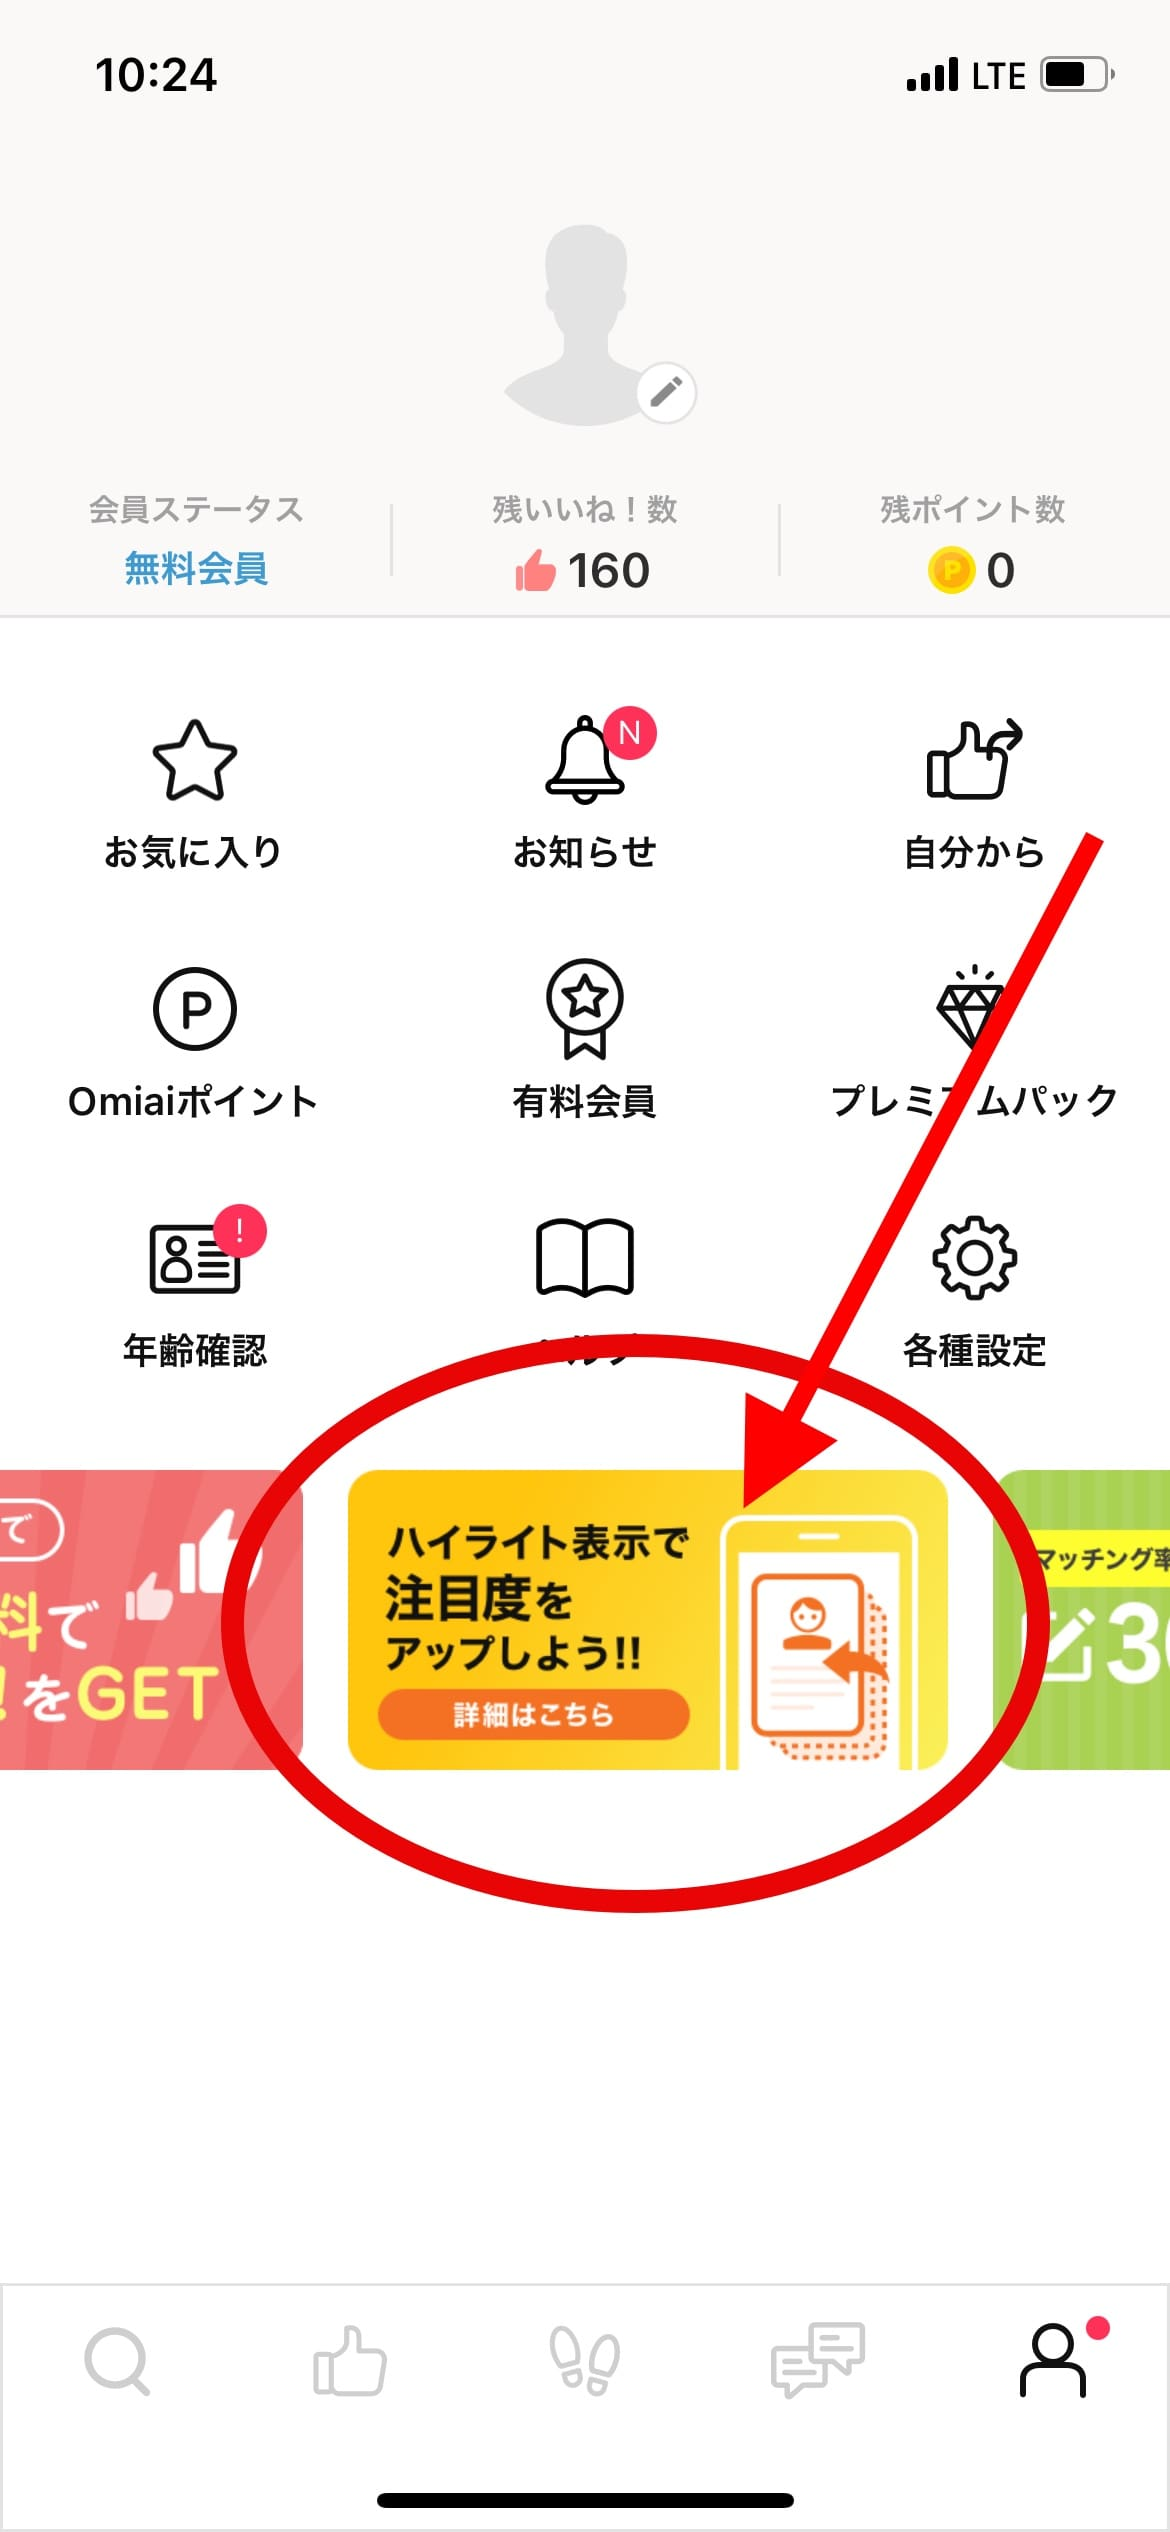 Omiai マイページ